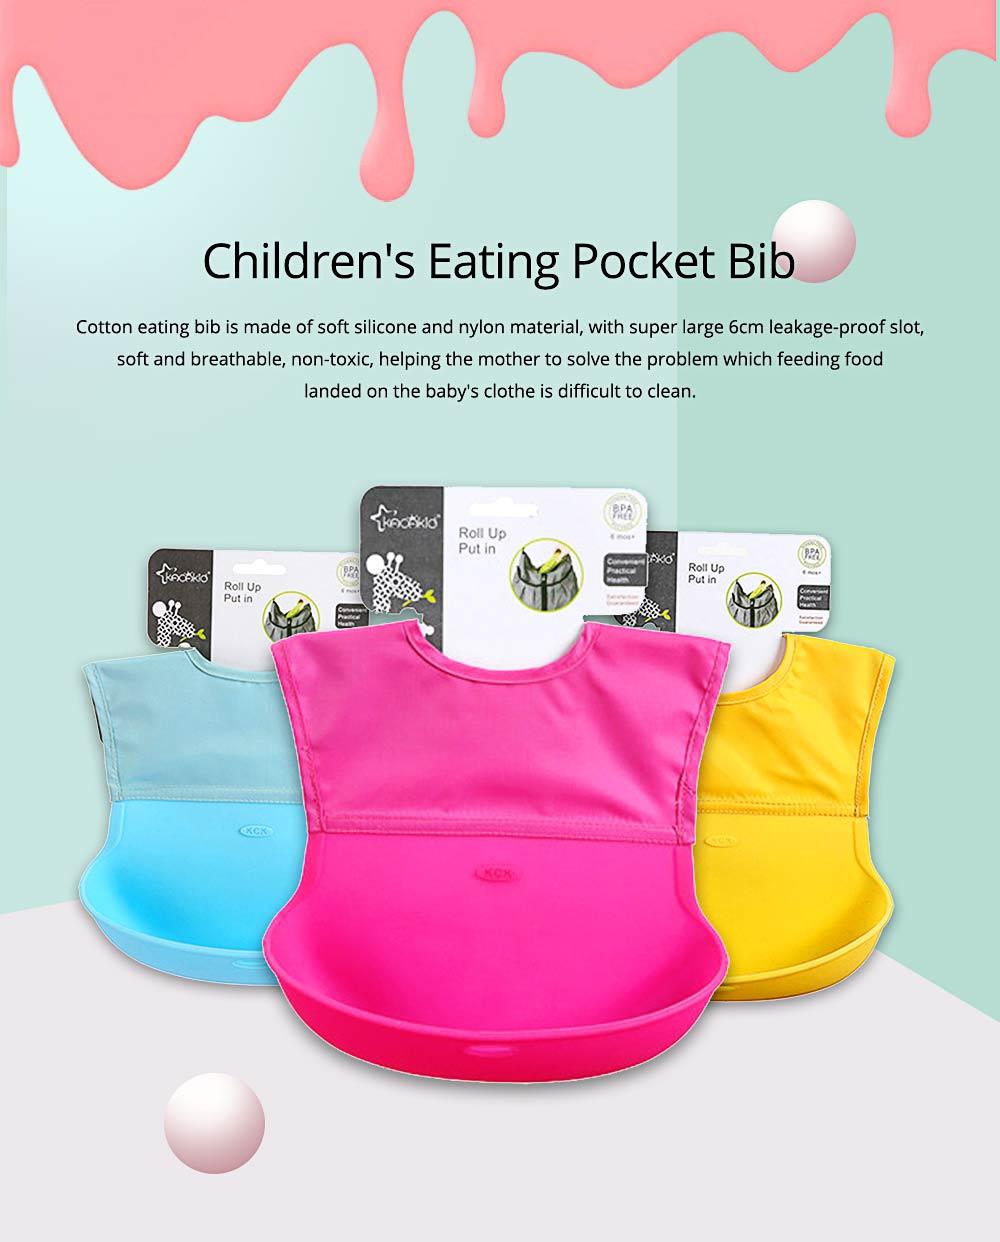 Baby Nylon Upper Waterproof Bib, Large Three-dimensional Soft Silicone Children's Eating Pocket Bib 0